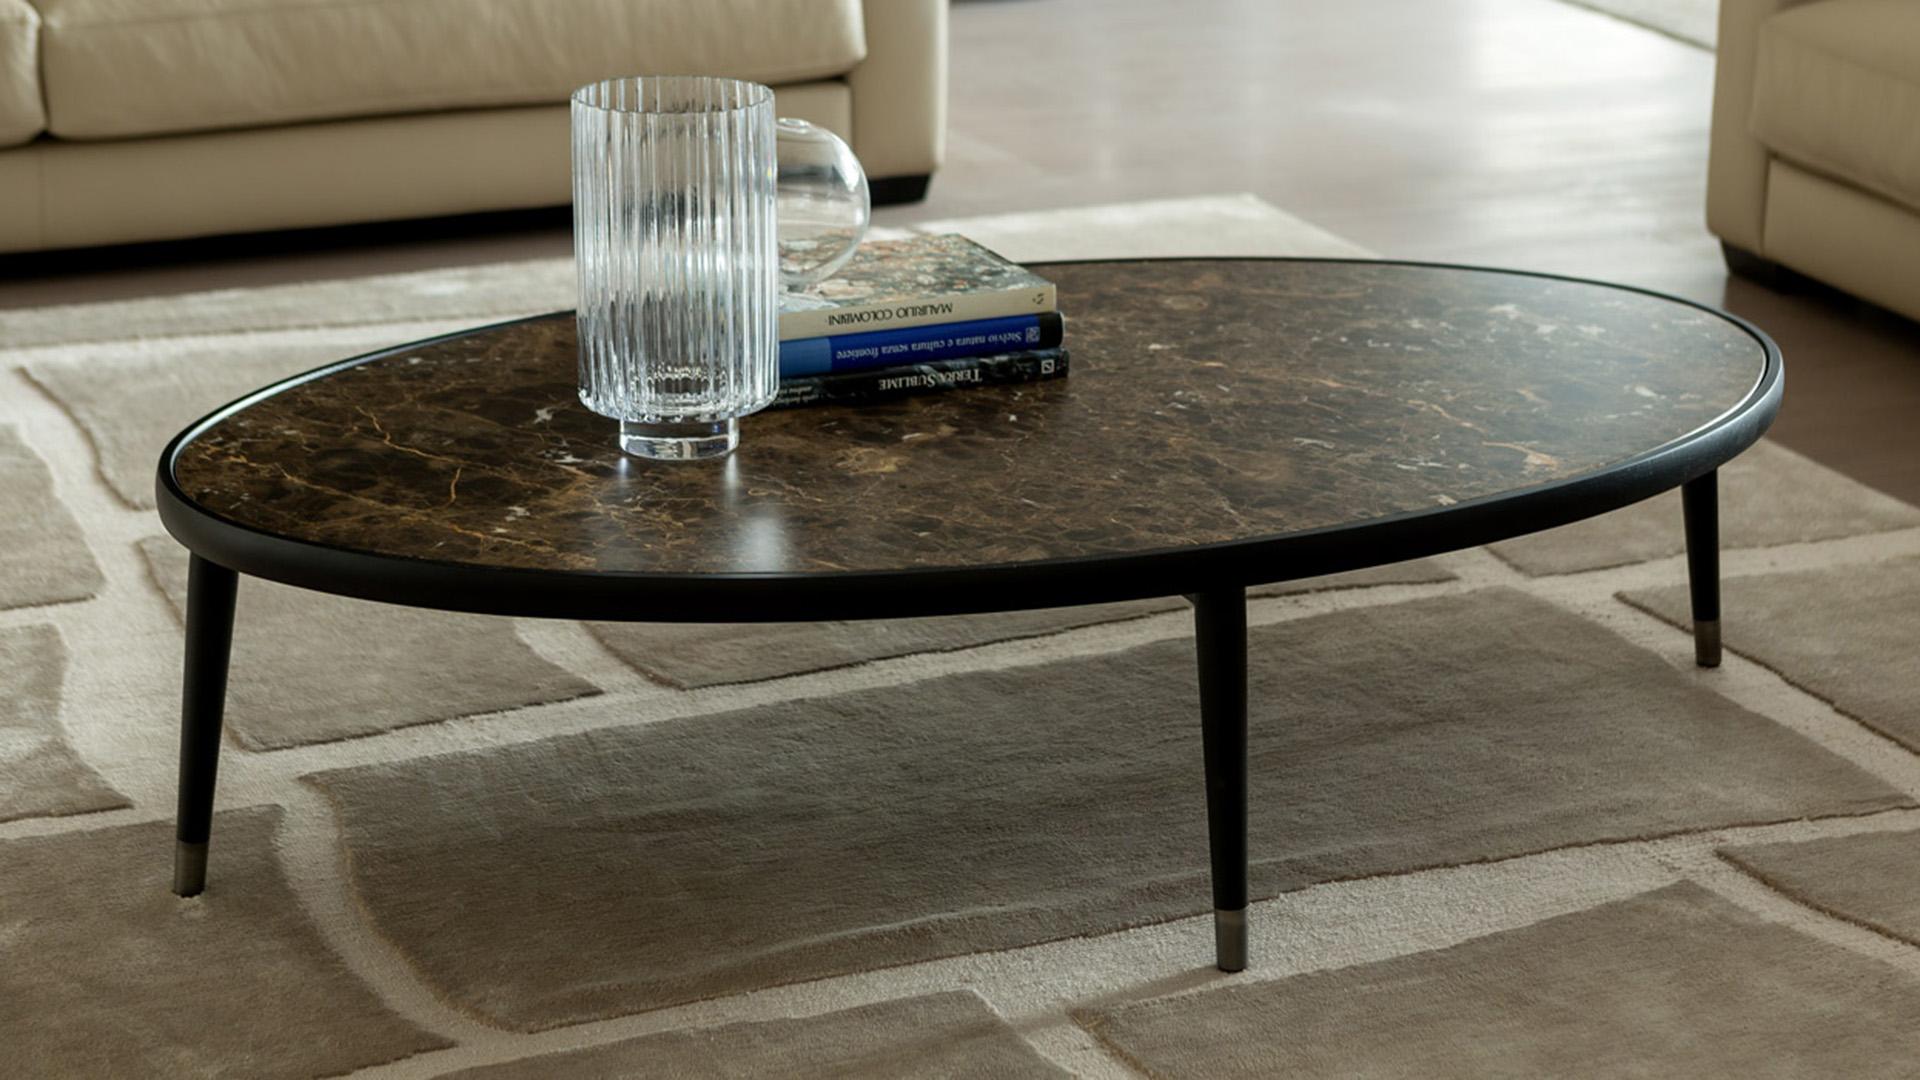 Porada Bign¨ Oval 150 Bigne OVAL 150 Coffee Table